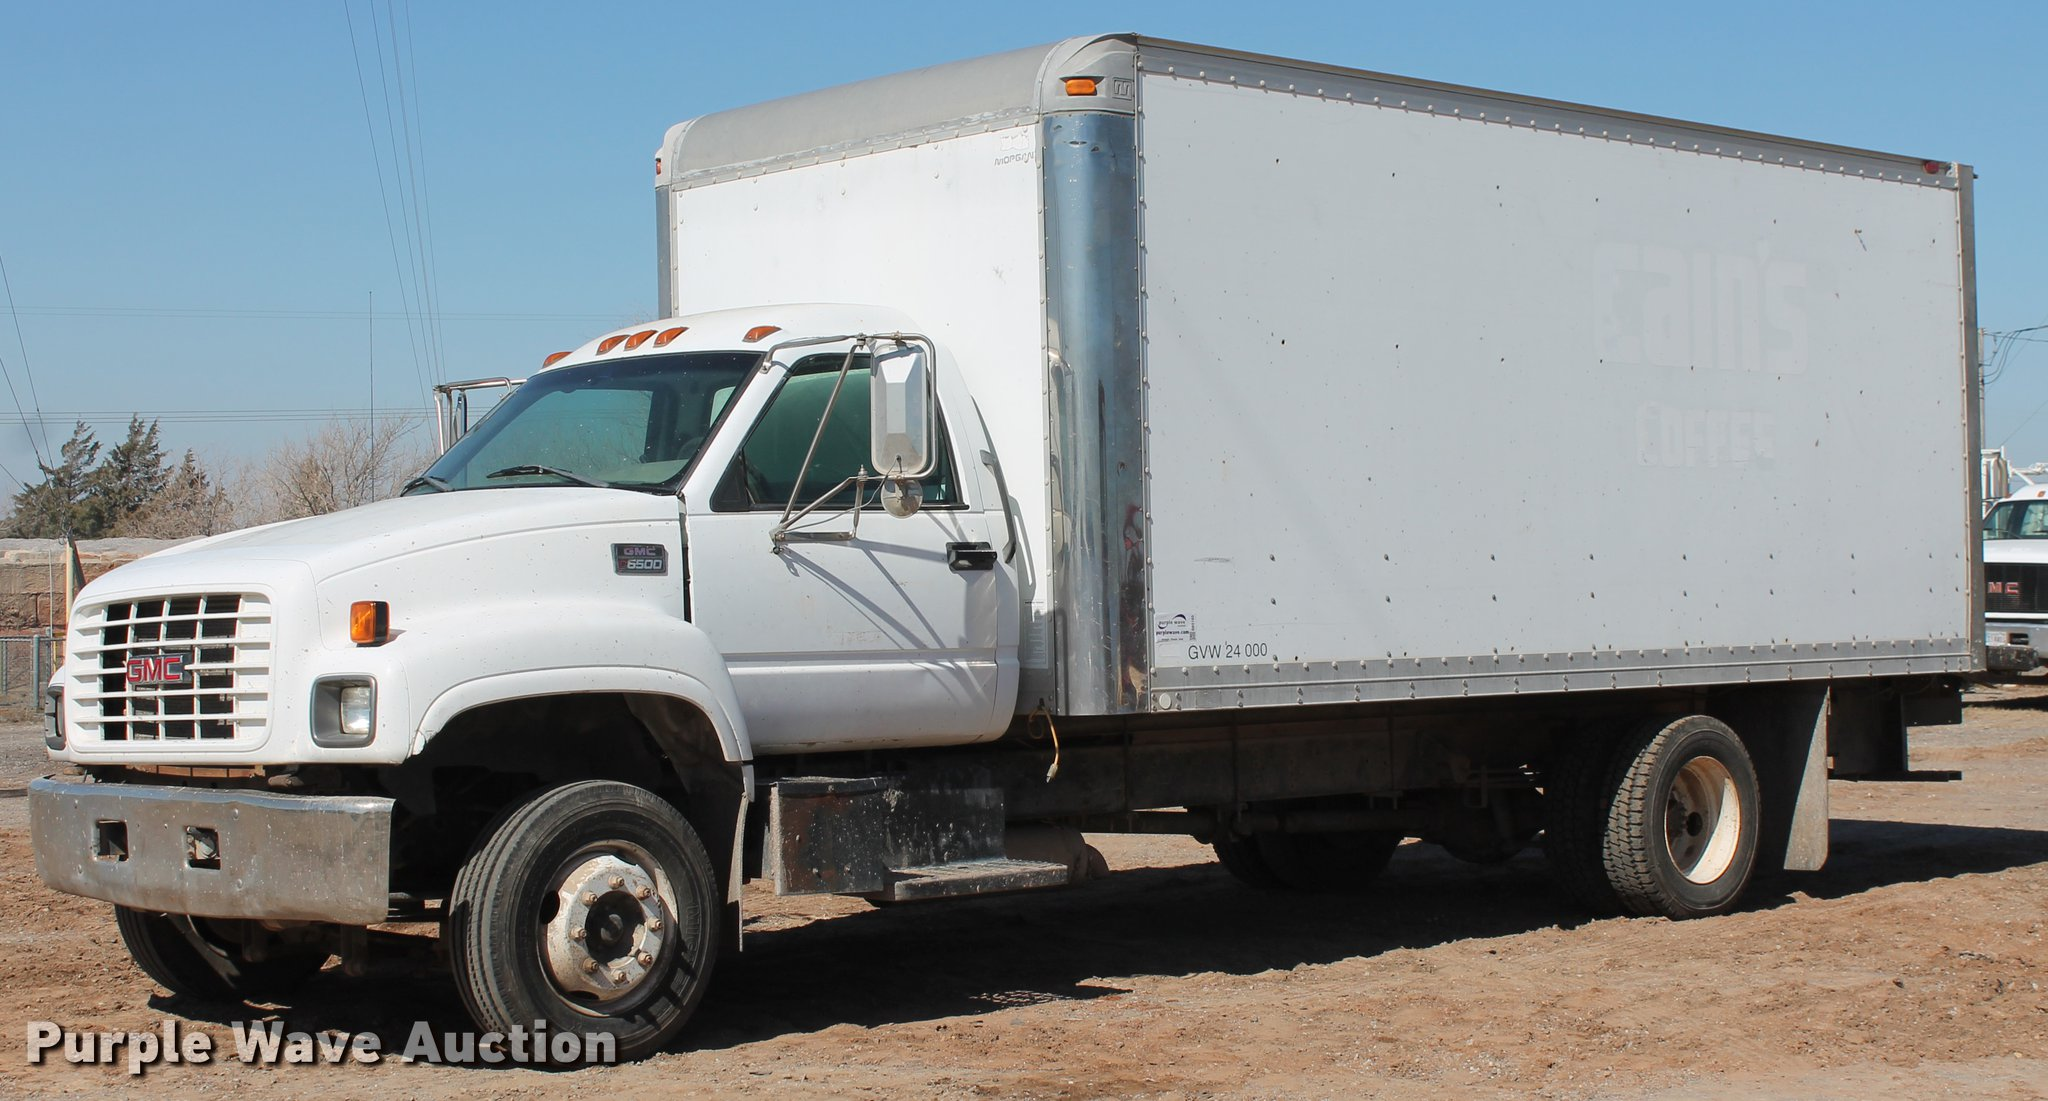 2002 gmc c6500 box truck item db5165 sold! april 4 vehic GMC Dump Truck db5165 image for item db5165 2002 gmc c6500 box truck